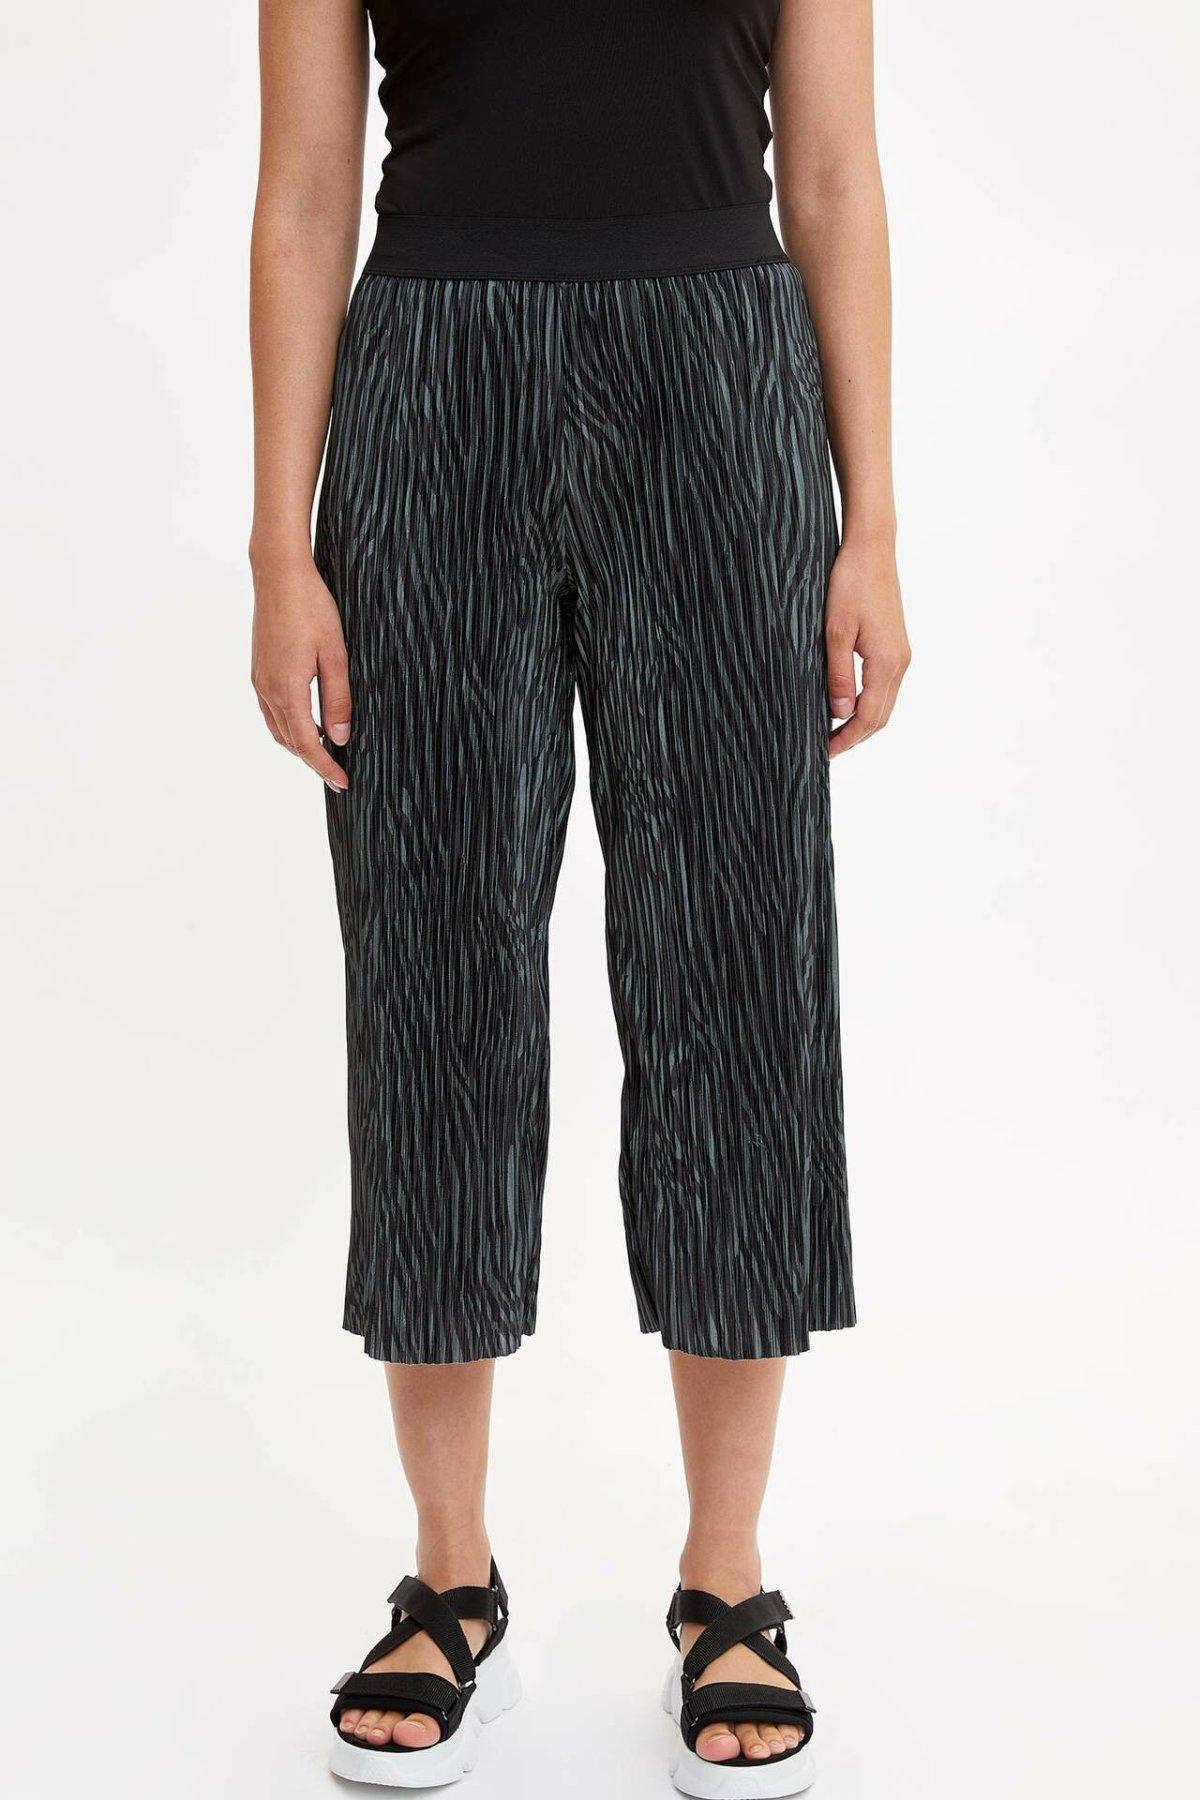 DeFacto Fashion Woman Elastic Waist Trousers Female Striped Wide-leg Crop Pants Ladies Casual Comfort Spring - K6989AZ19SM